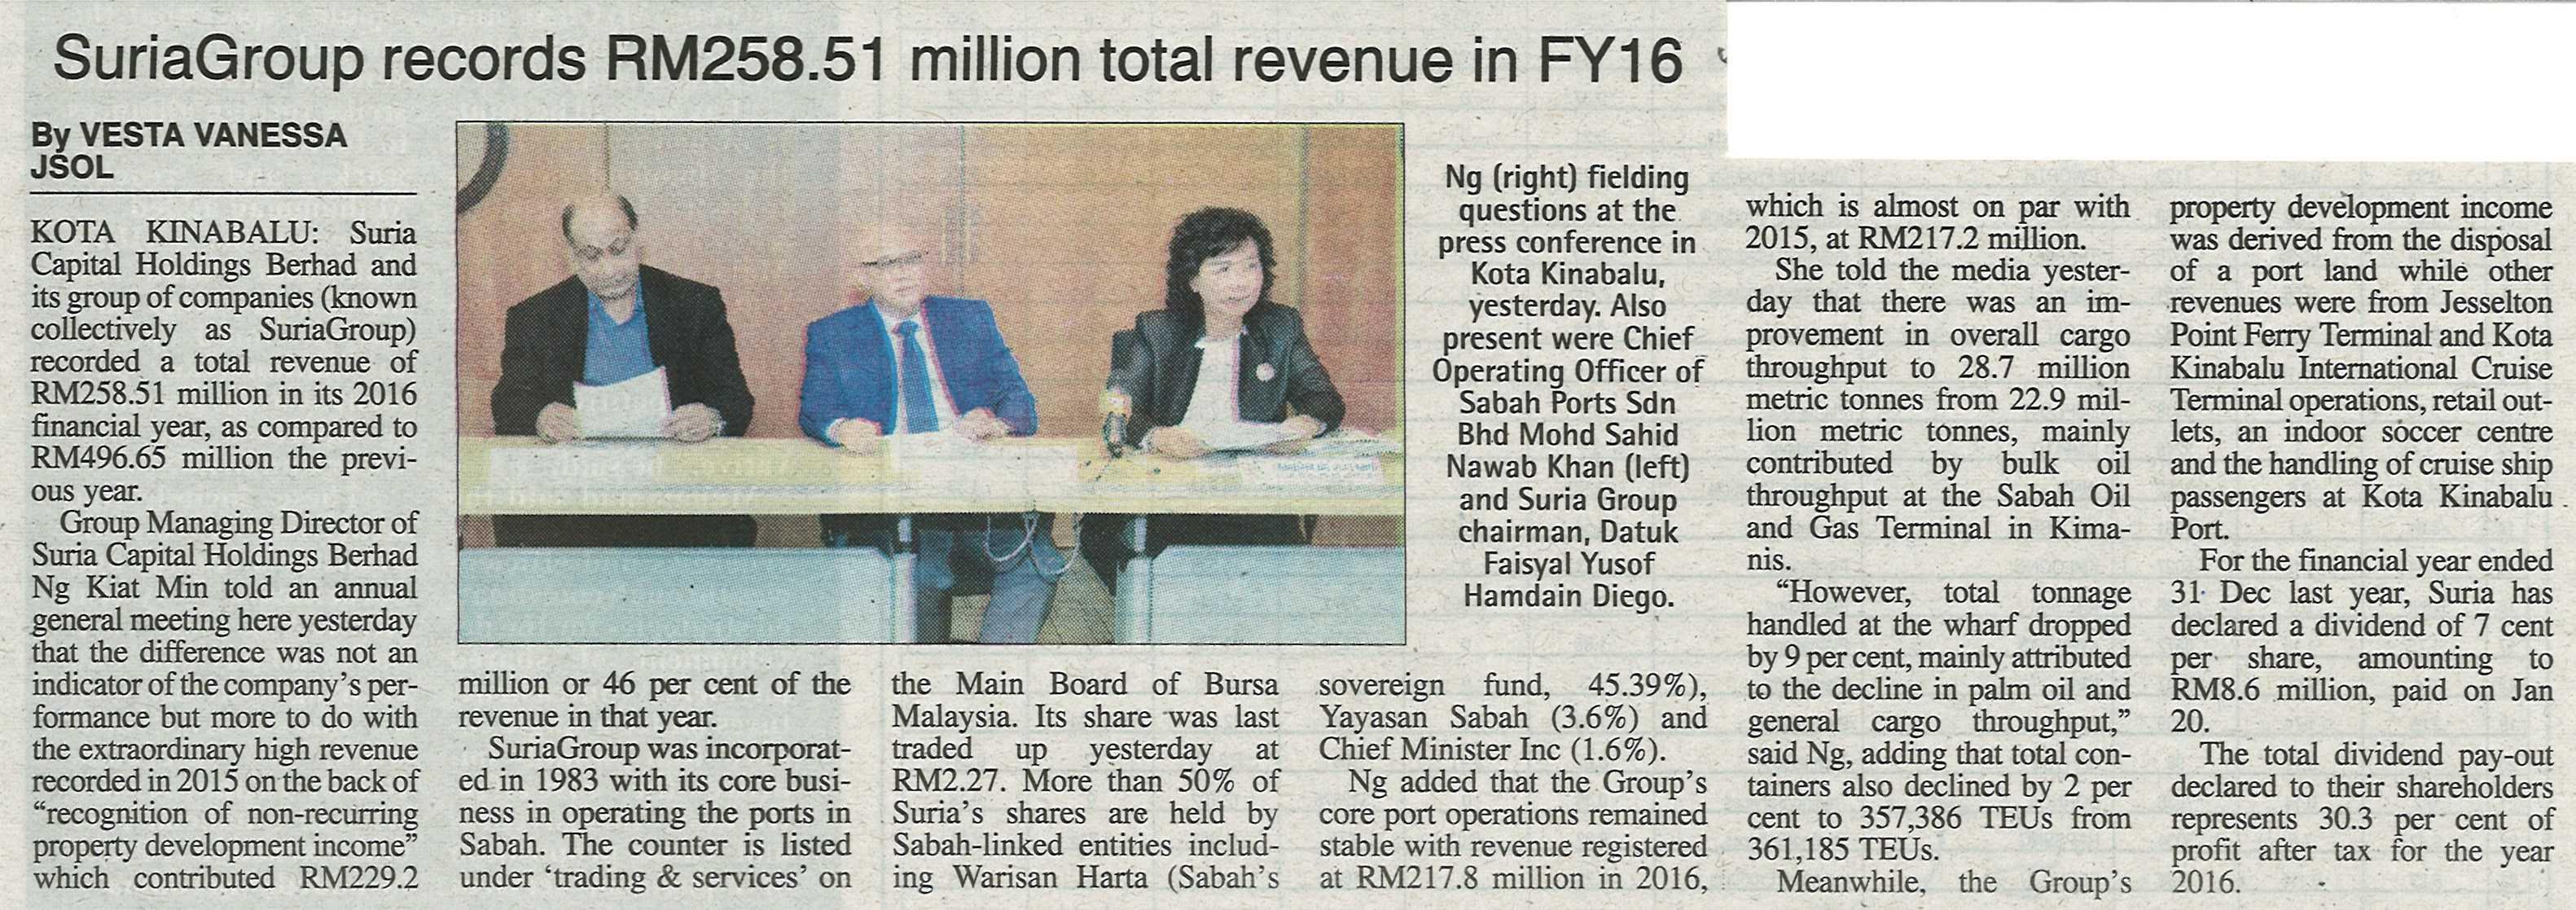 SuriaGroup Records RM258.51 Million Total Revenue in FY16